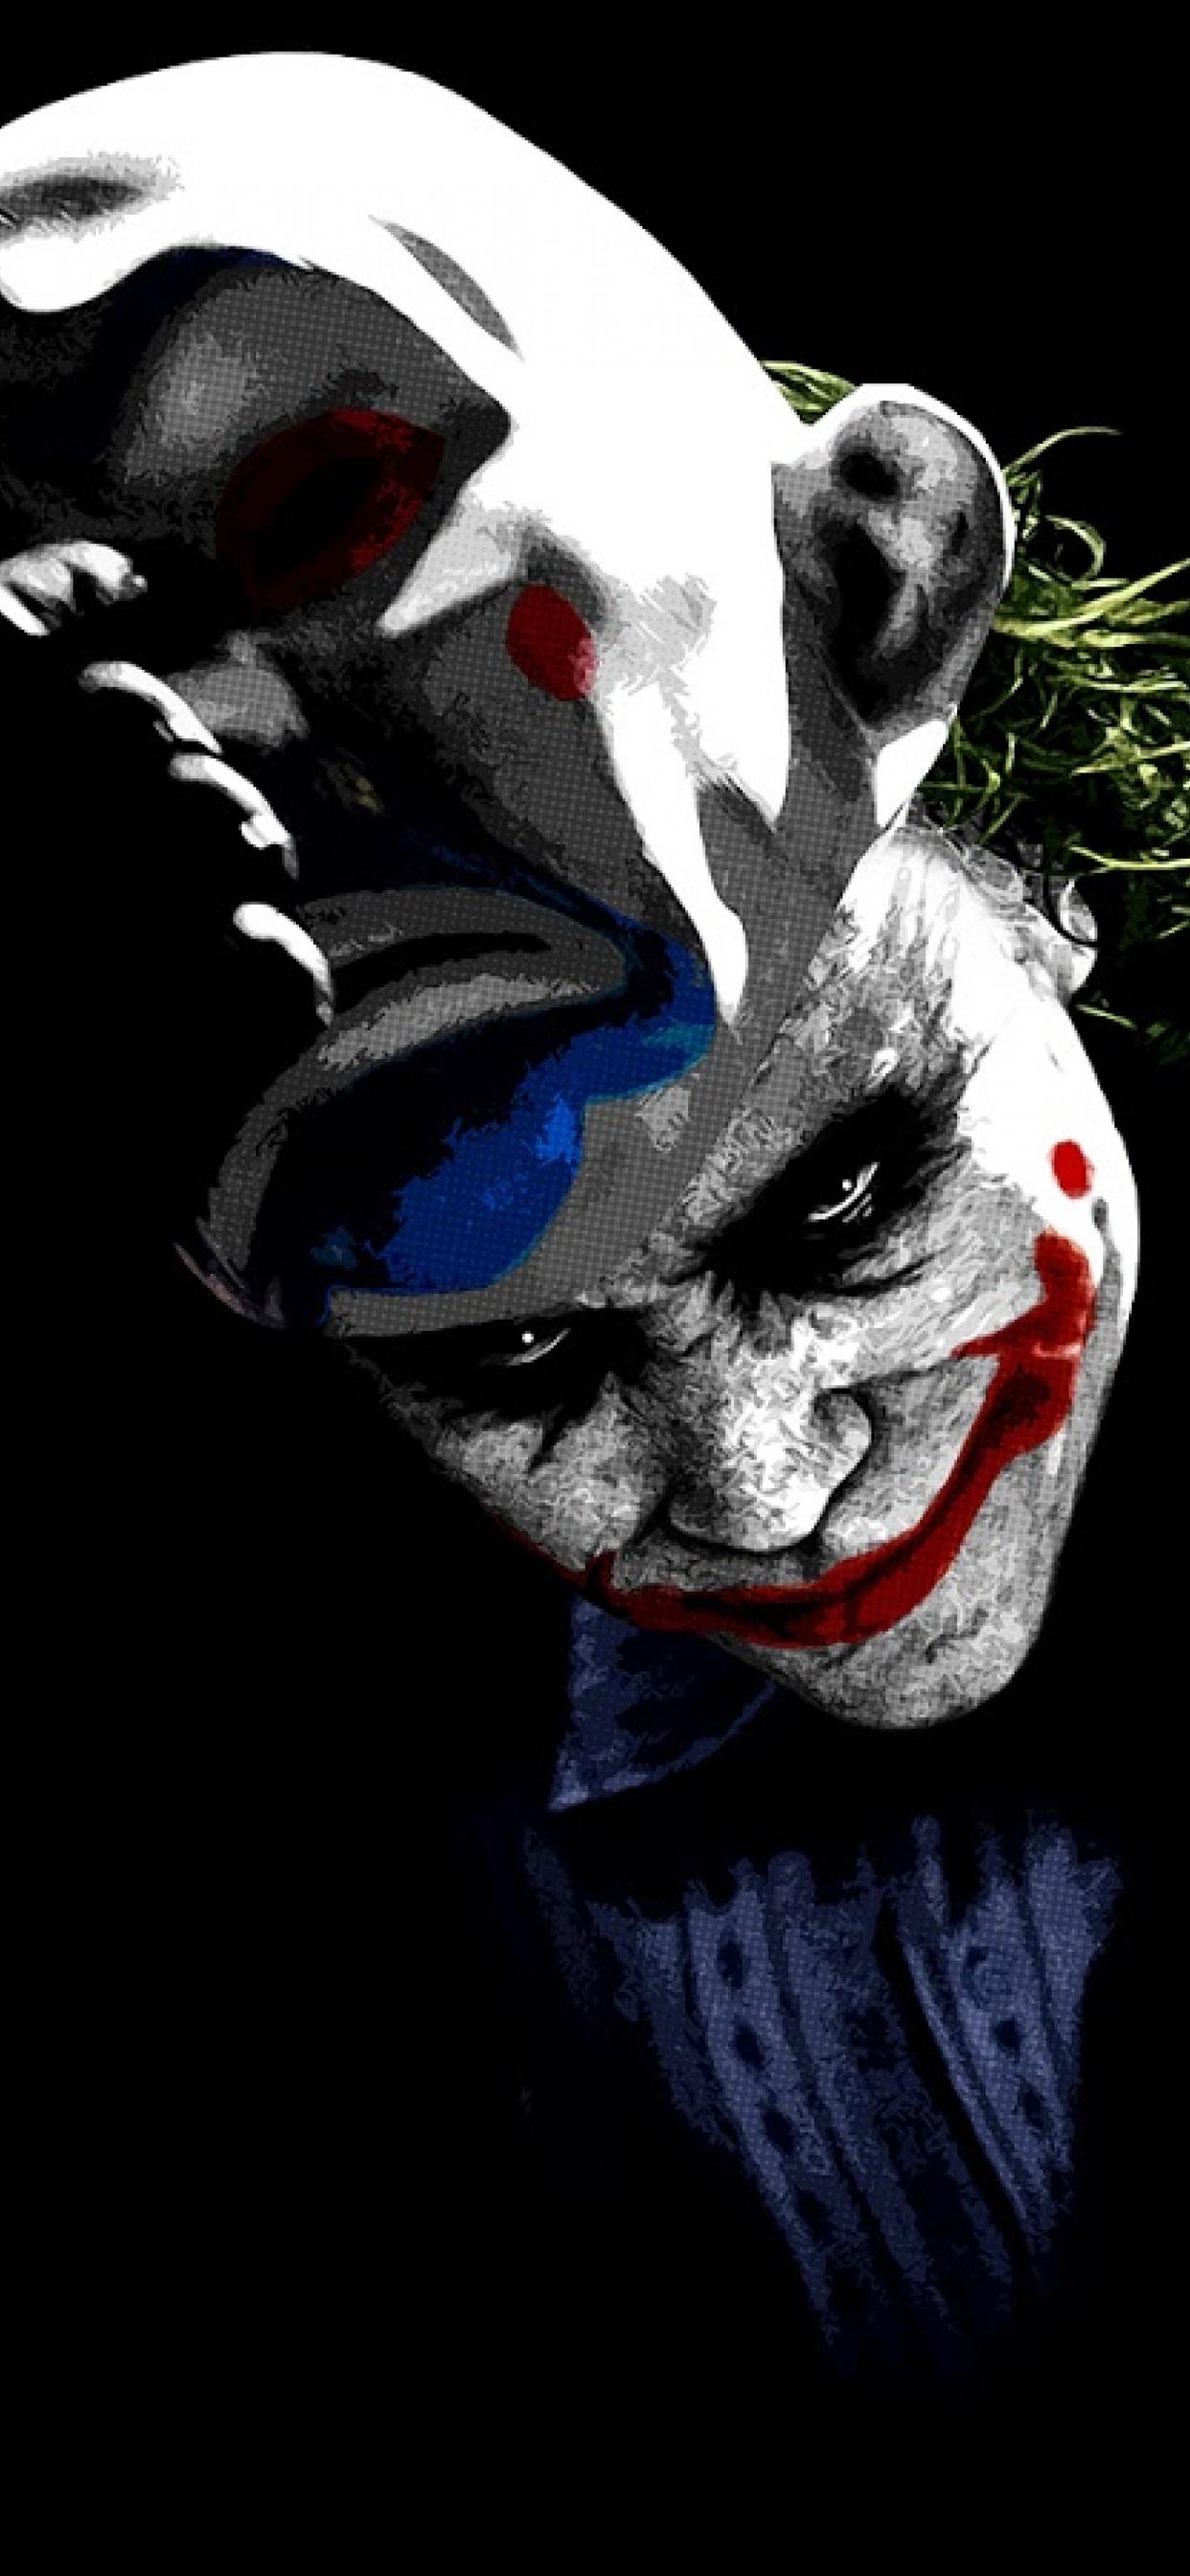 1242x2688 Joker 8k Iphone Xs Max Hd 4k Wallpapers Images